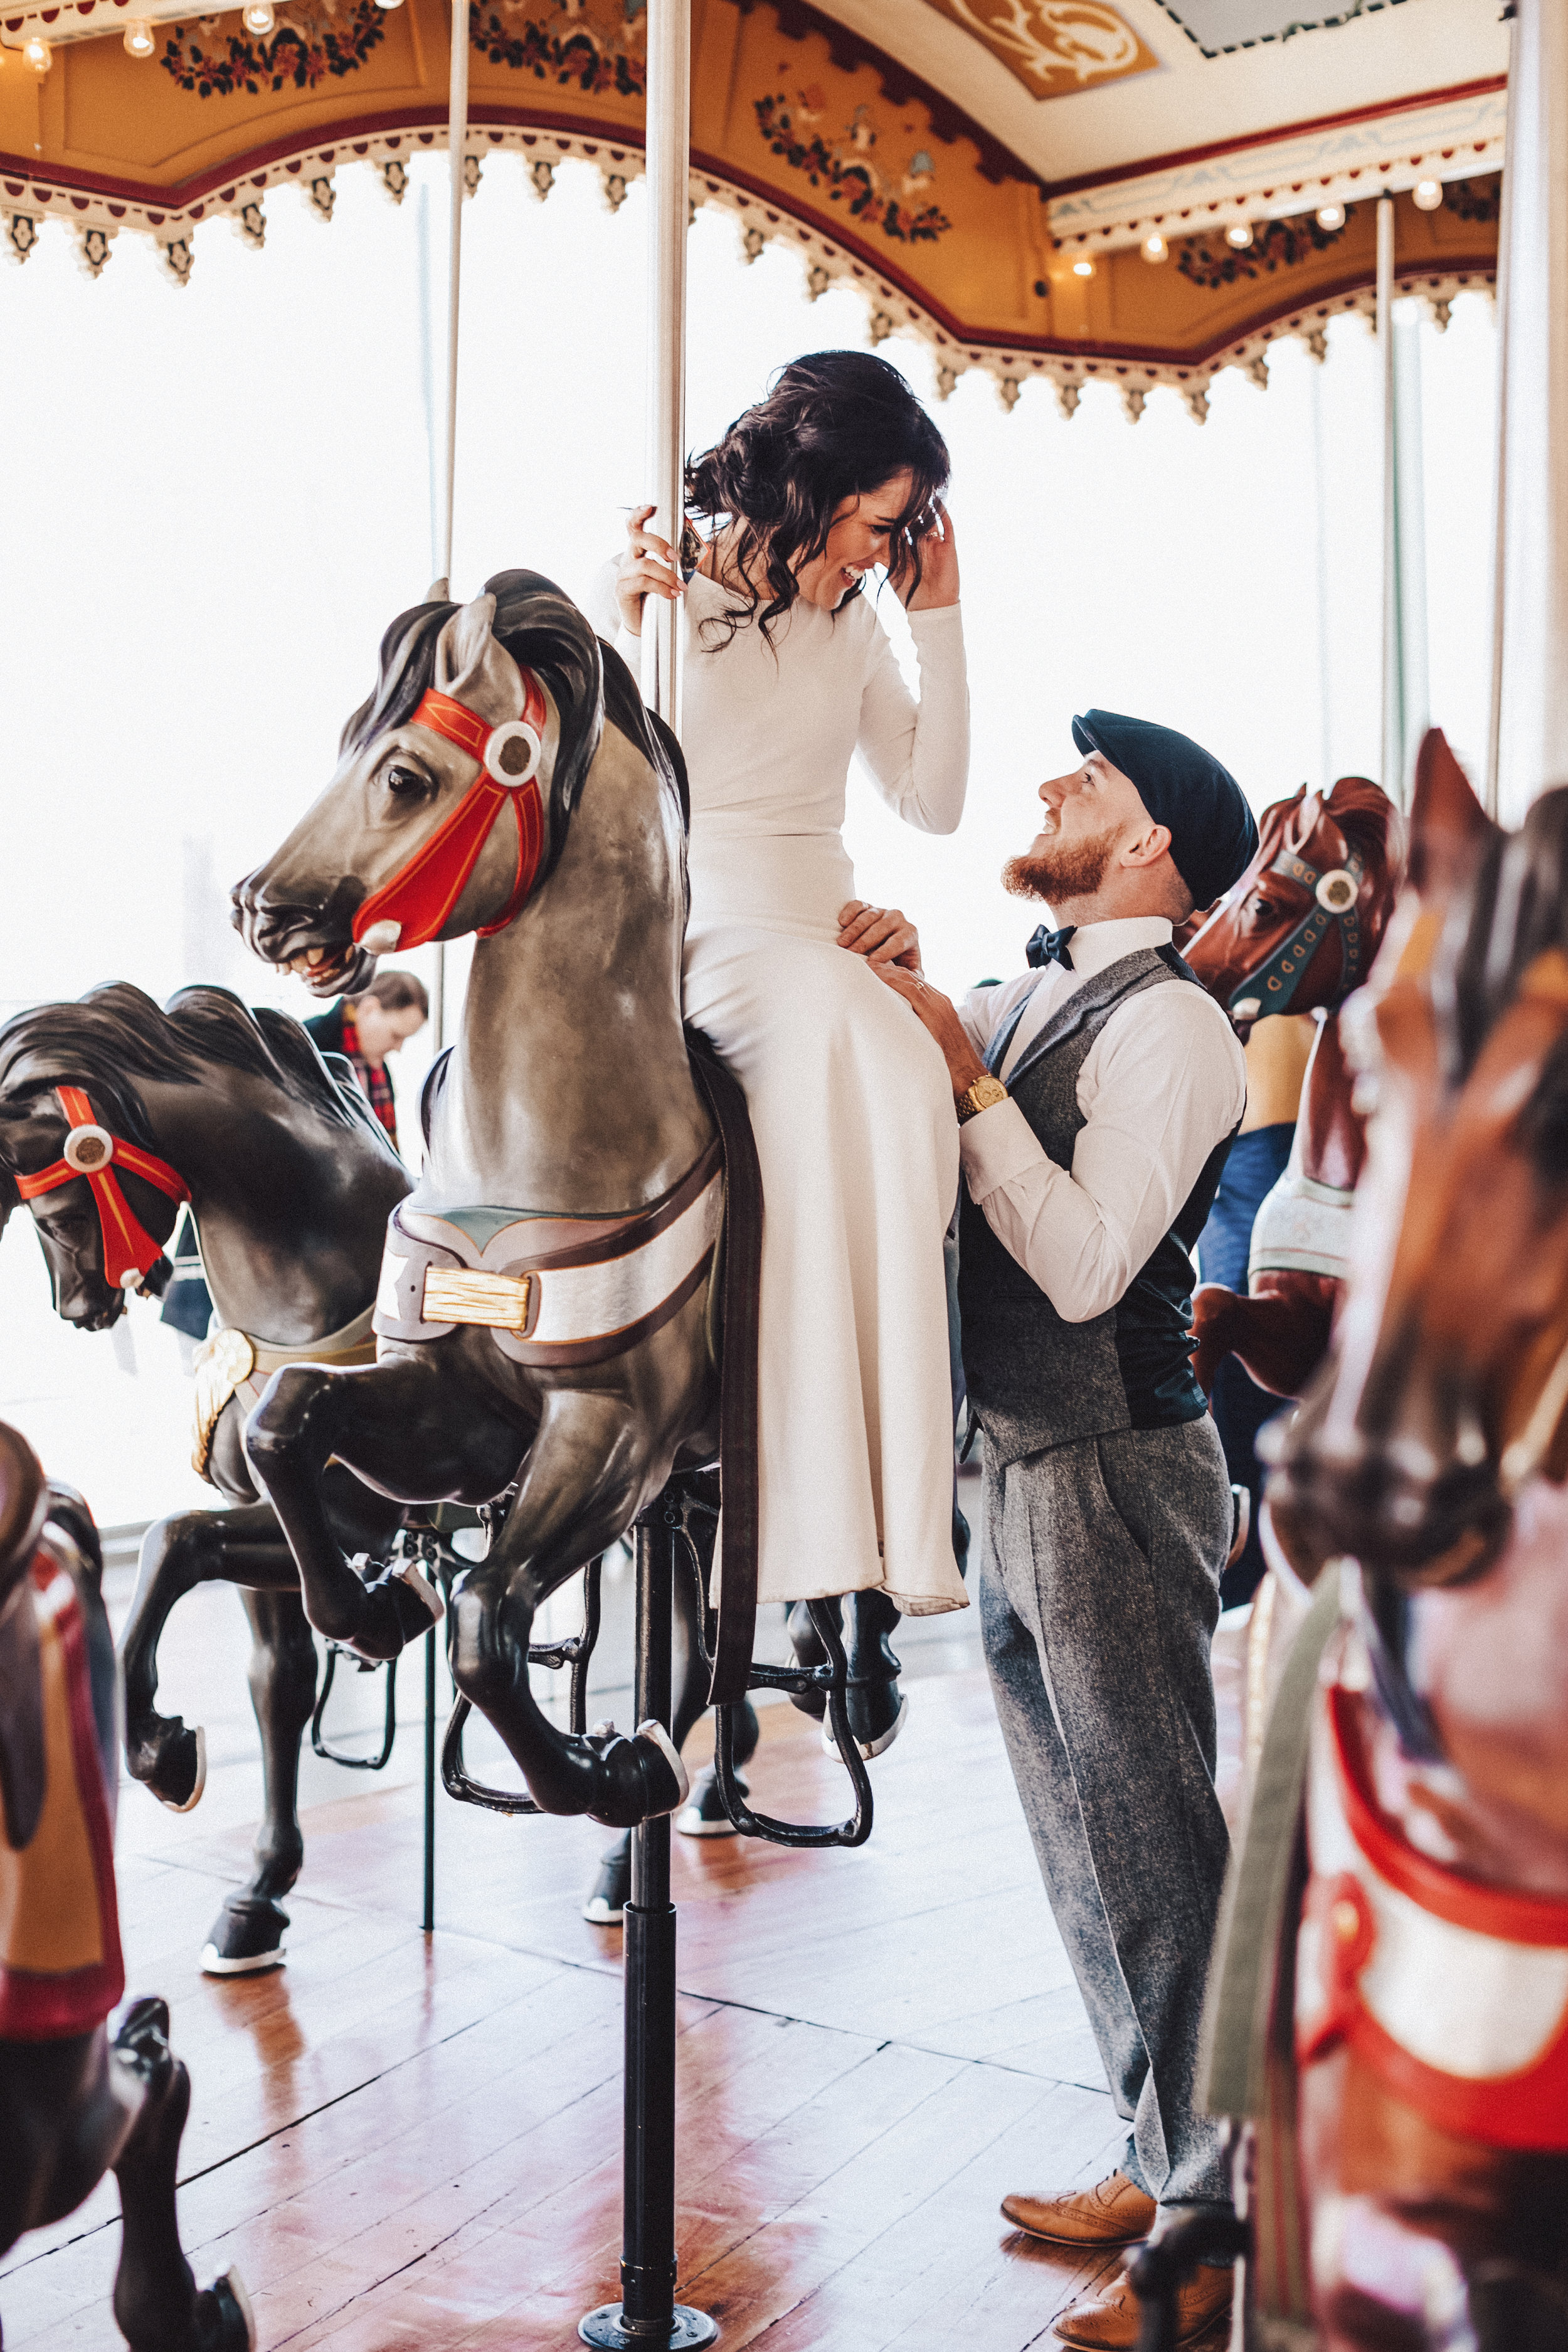 GinaEspositoInc_Weddings_5-2 copy.jpg